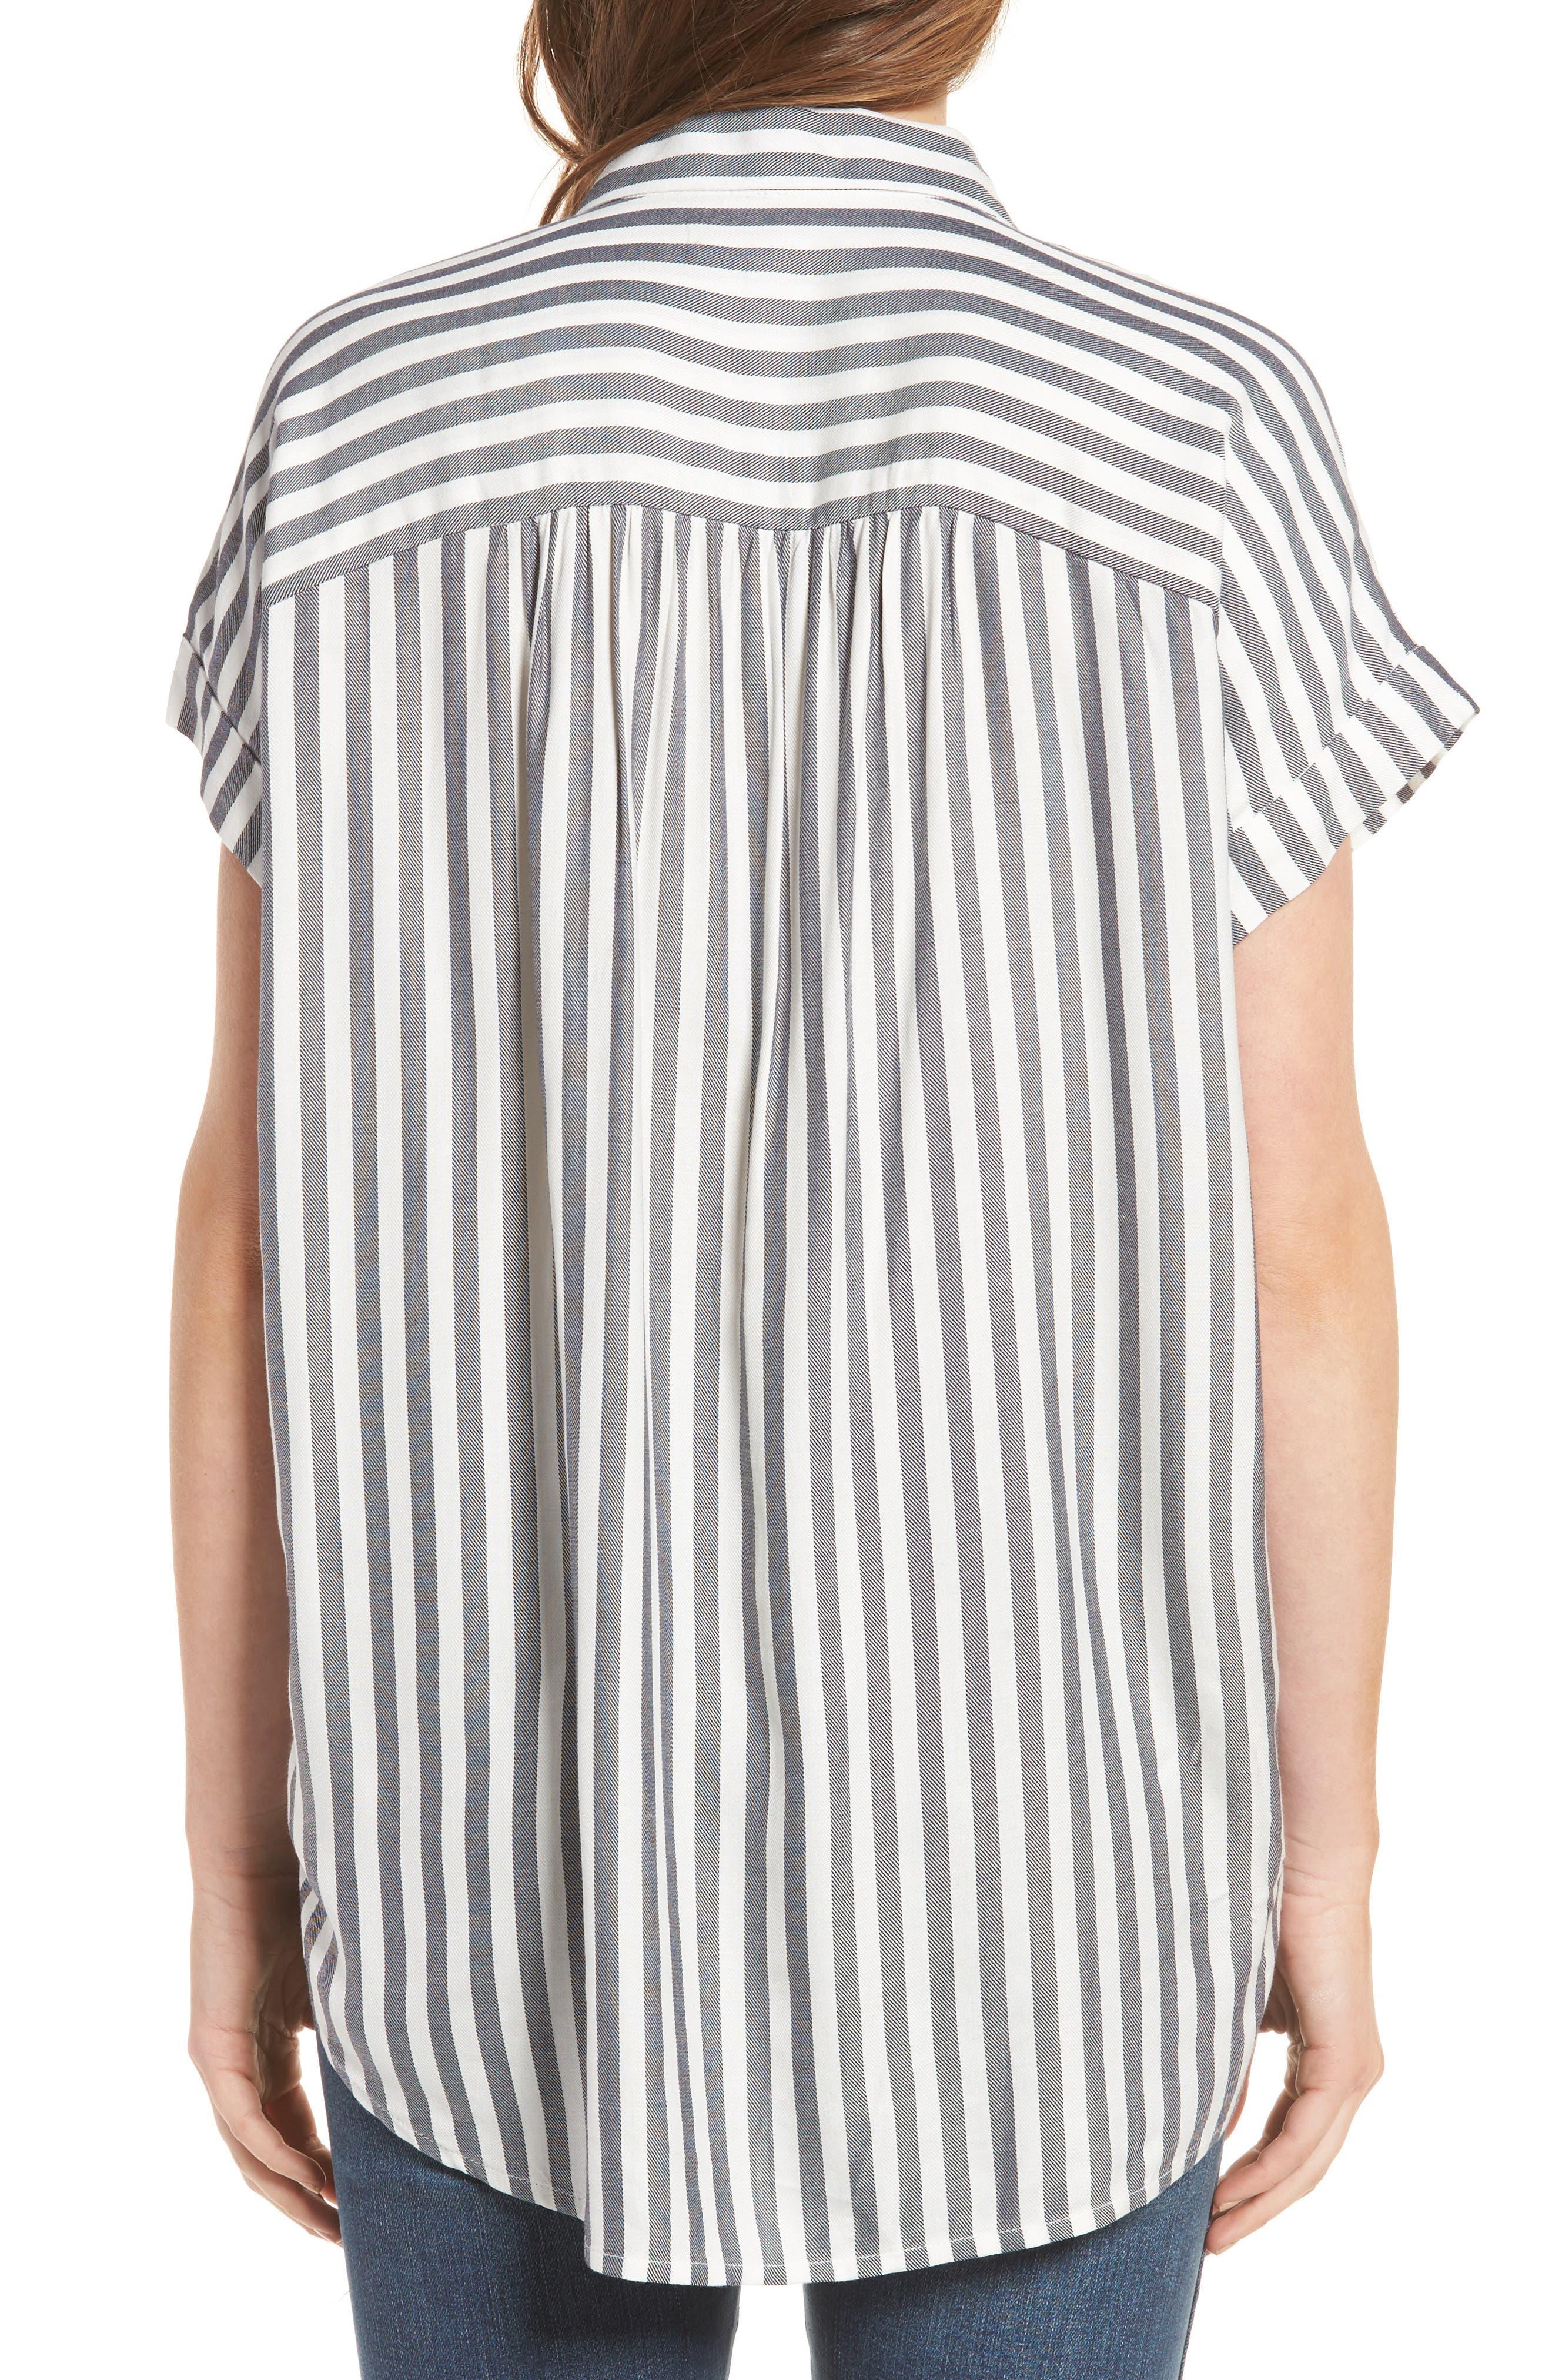 Central Shirt,                             Alternate thumbnail 2, color,                             401